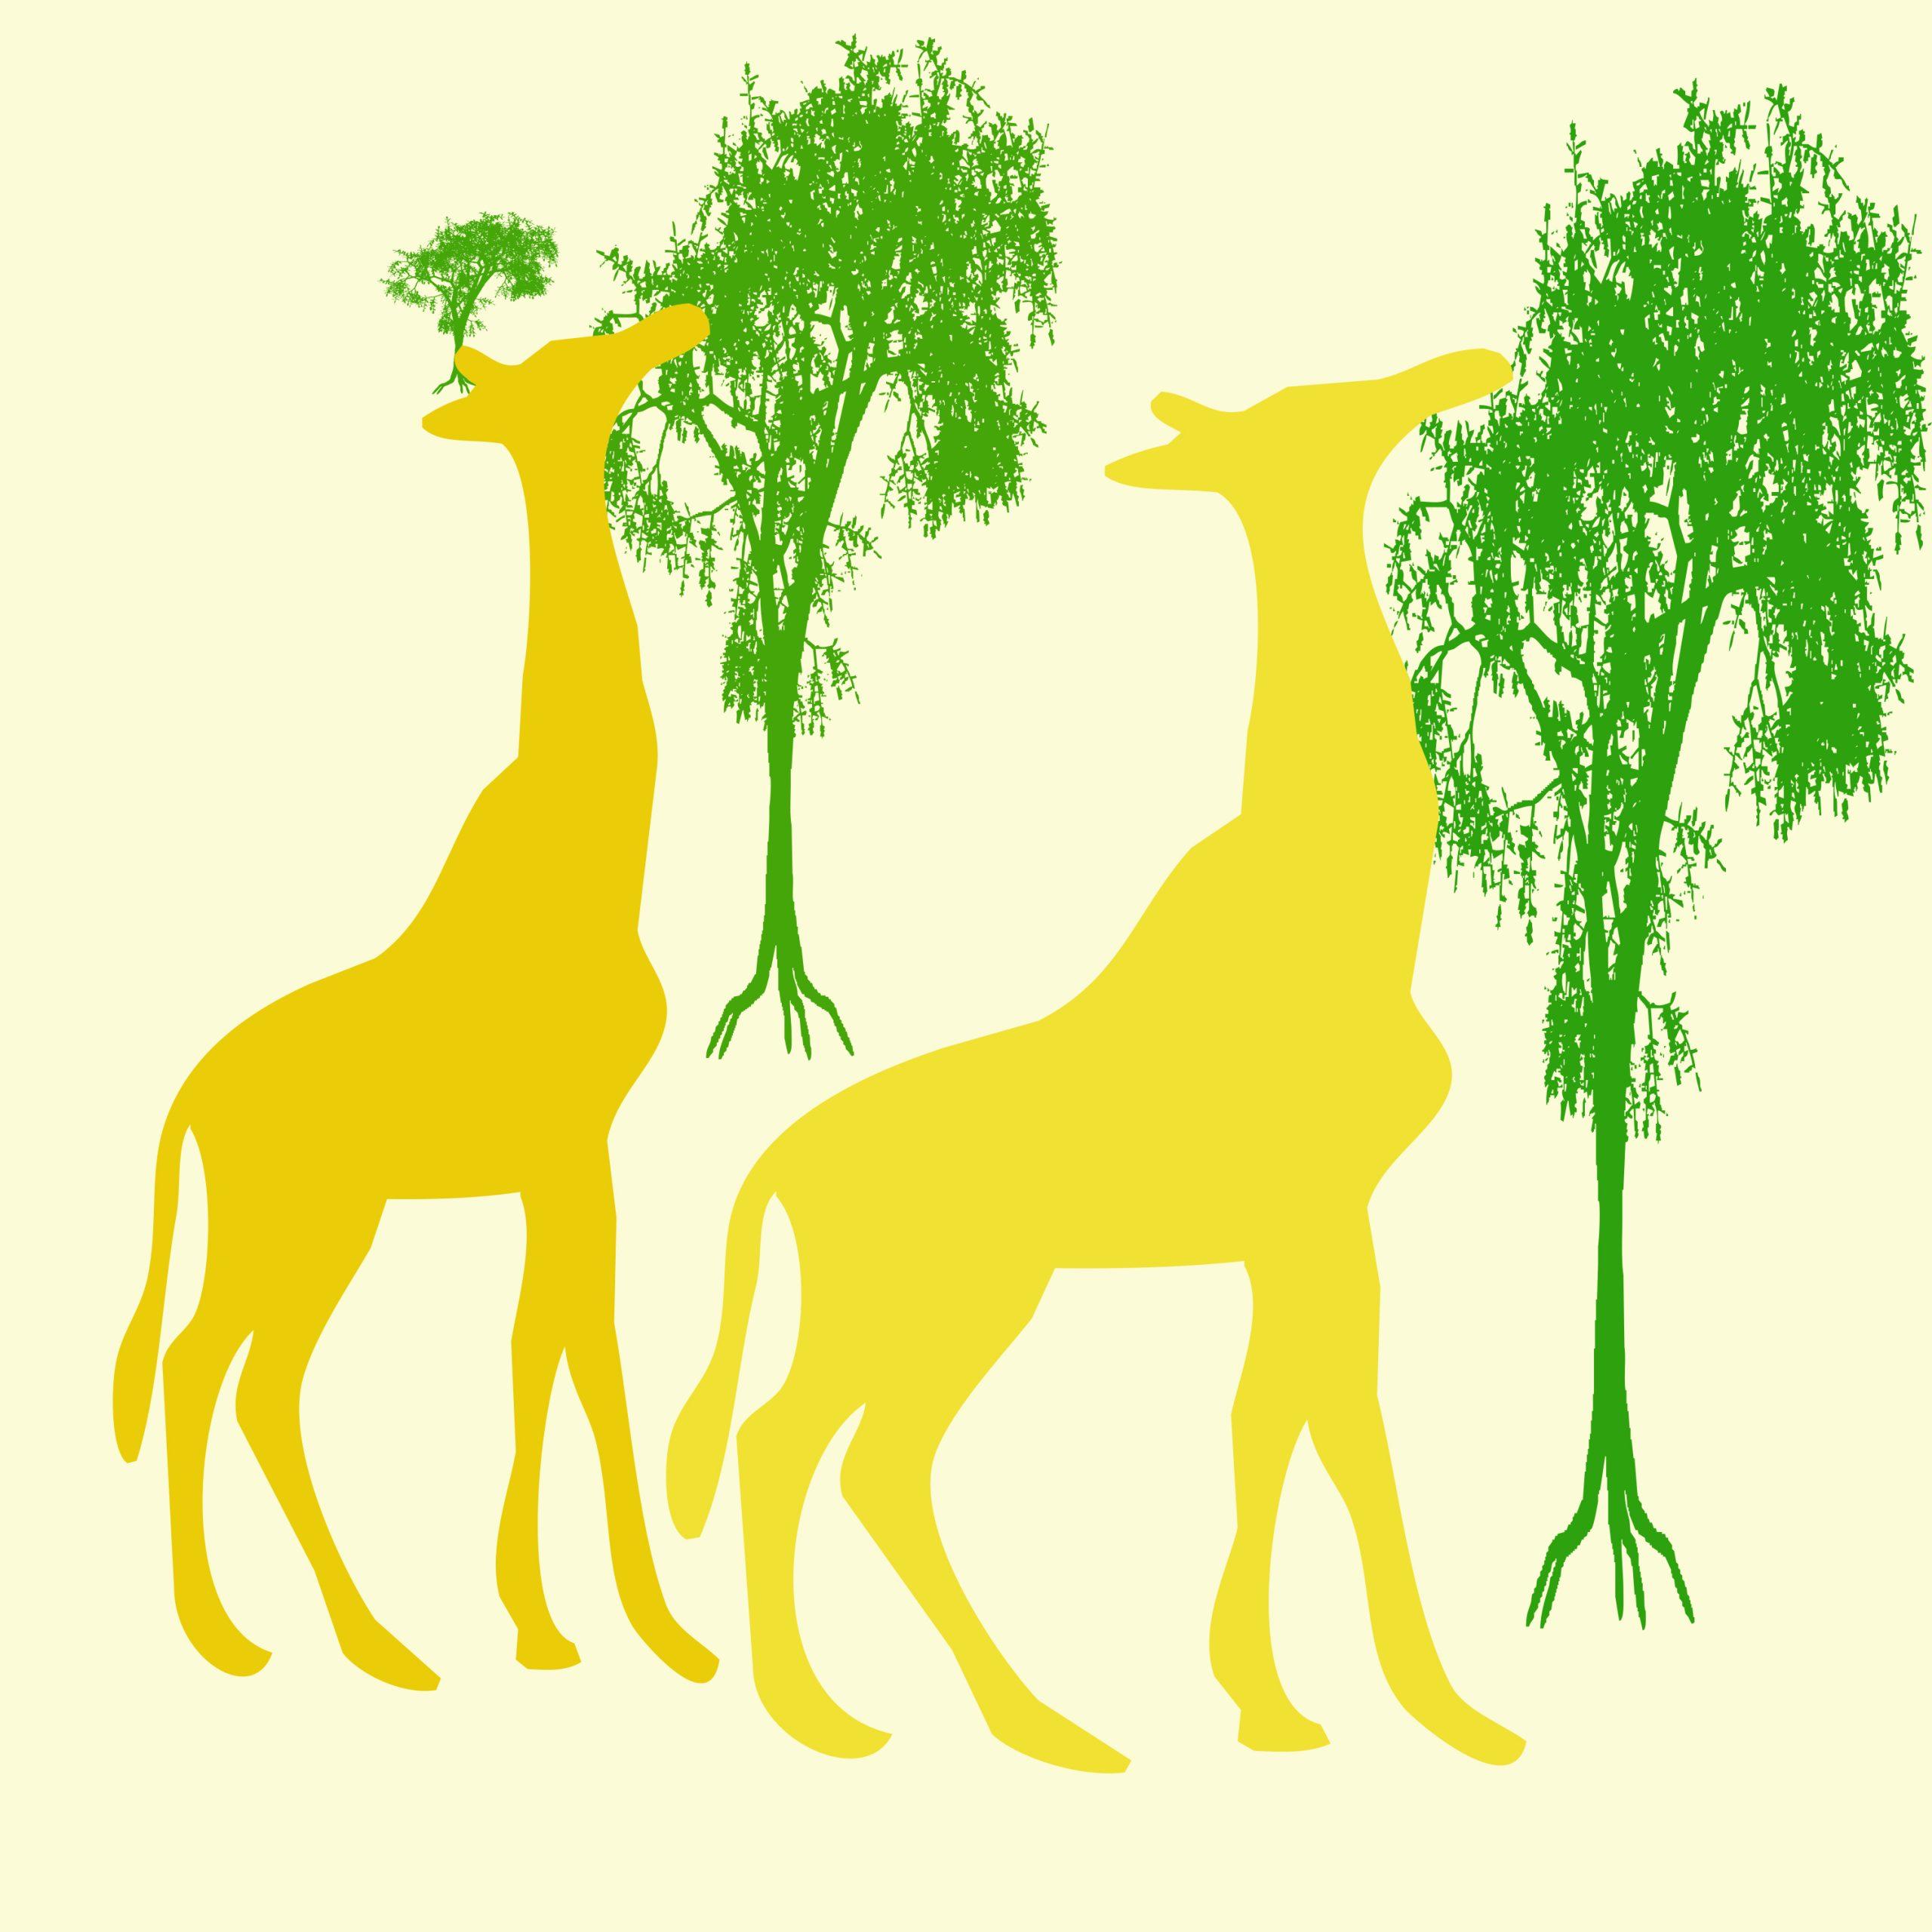 Giraffe and trees illustration